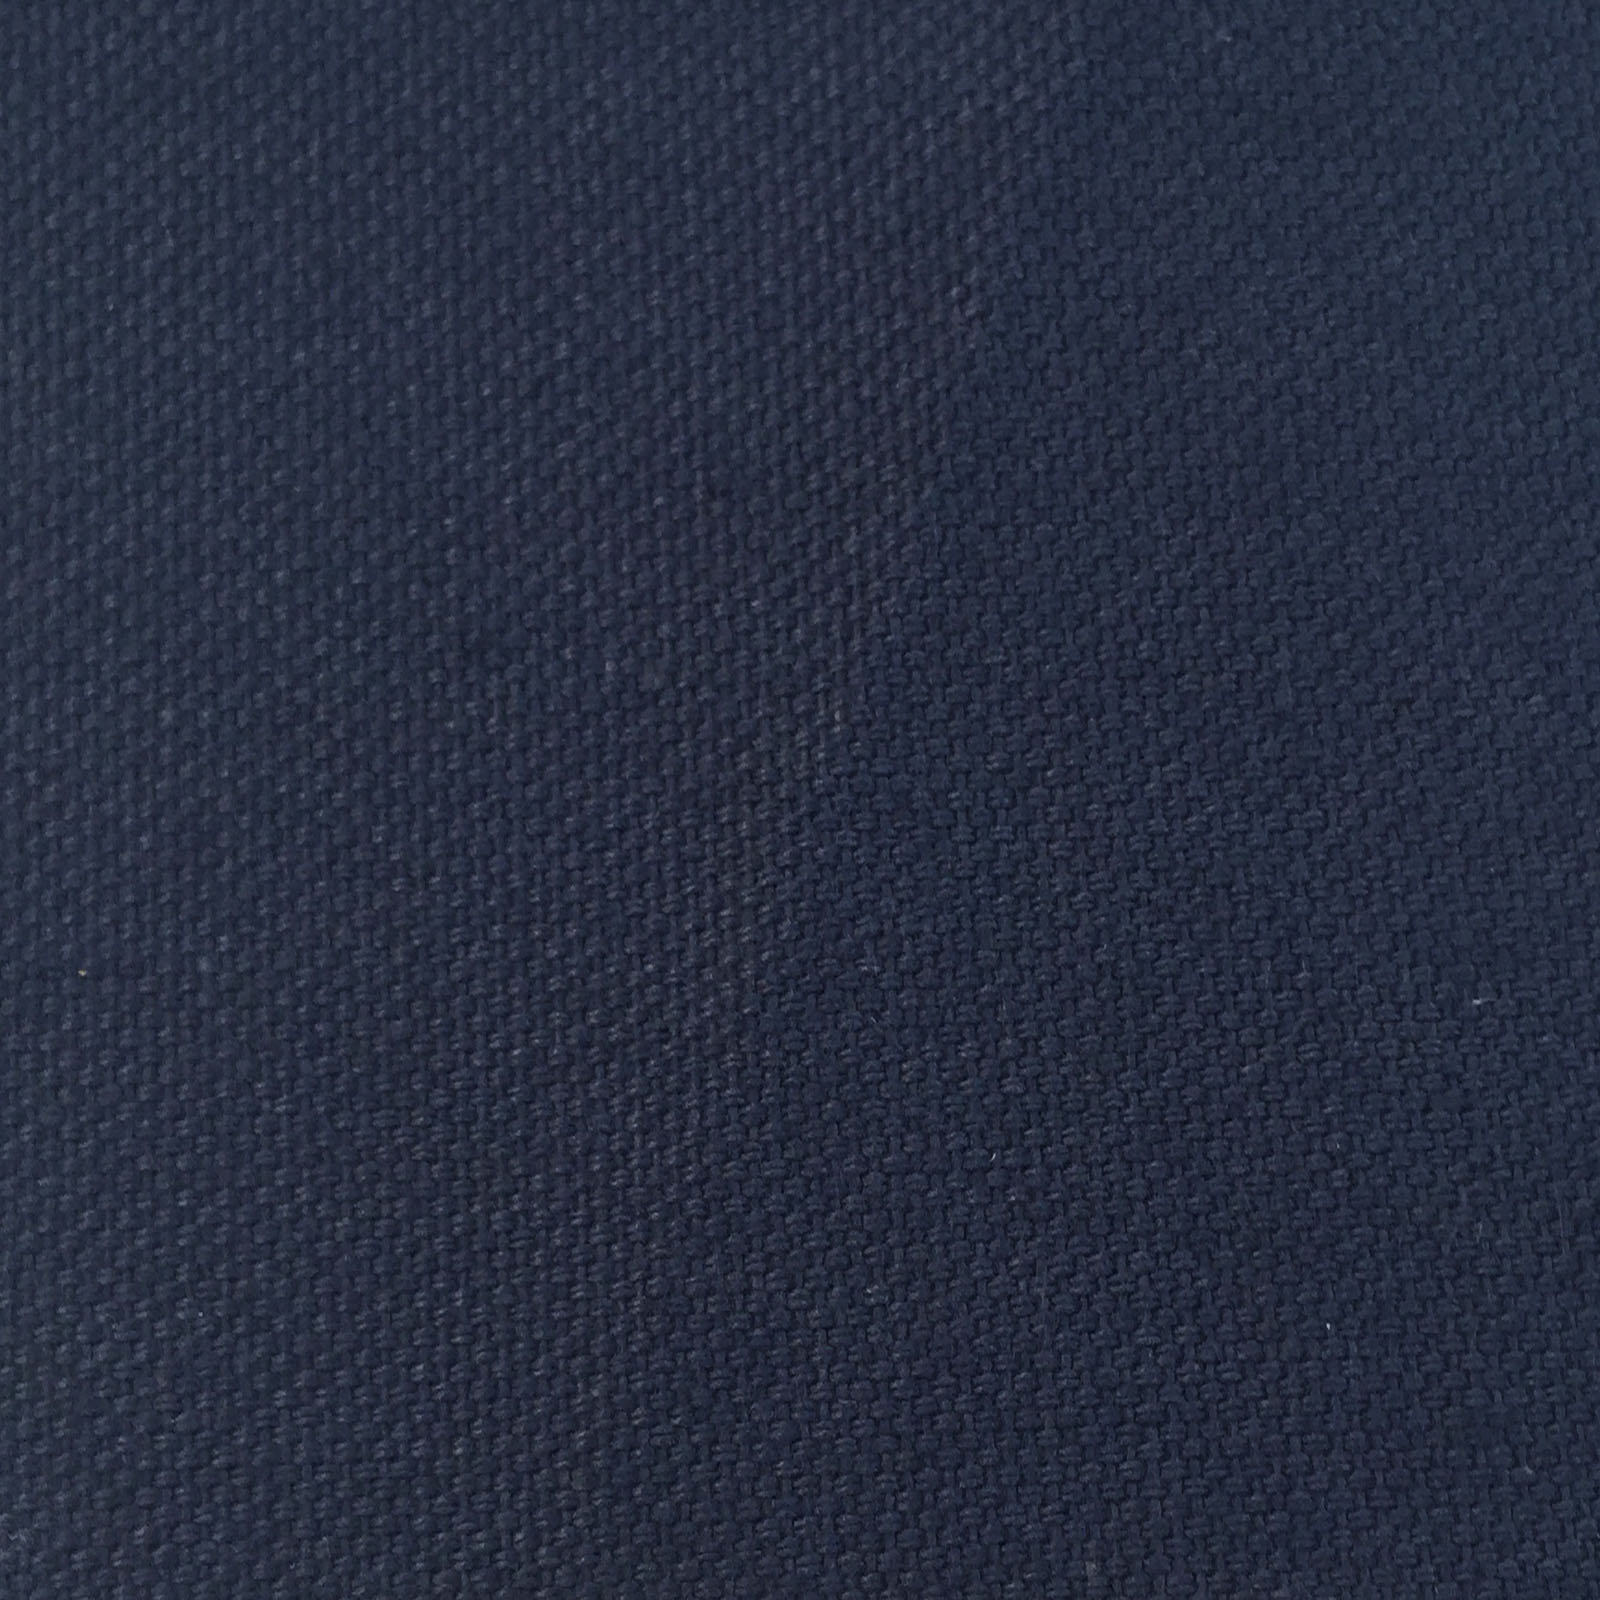 Navy Blue 10 oz Canvas Dropcloth  Chicago Canvas  Supply